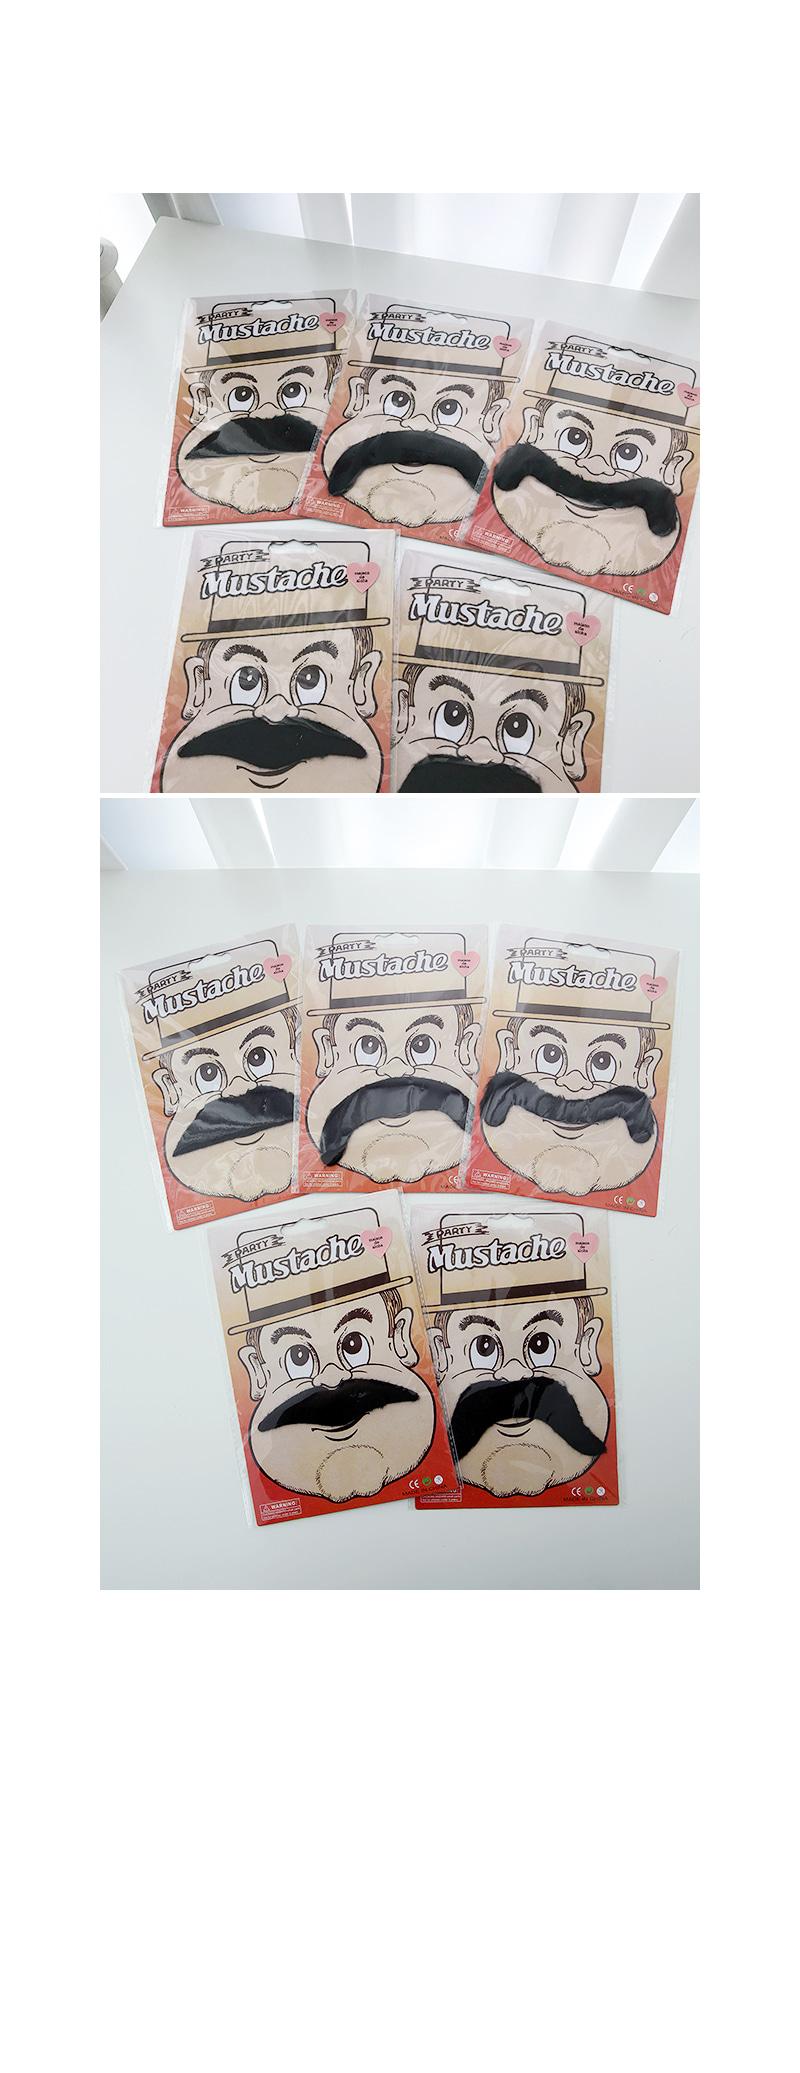 Mustache - 2개 - 메종드알로하, 2,000원, 파티의상/잡화, 가면/안경